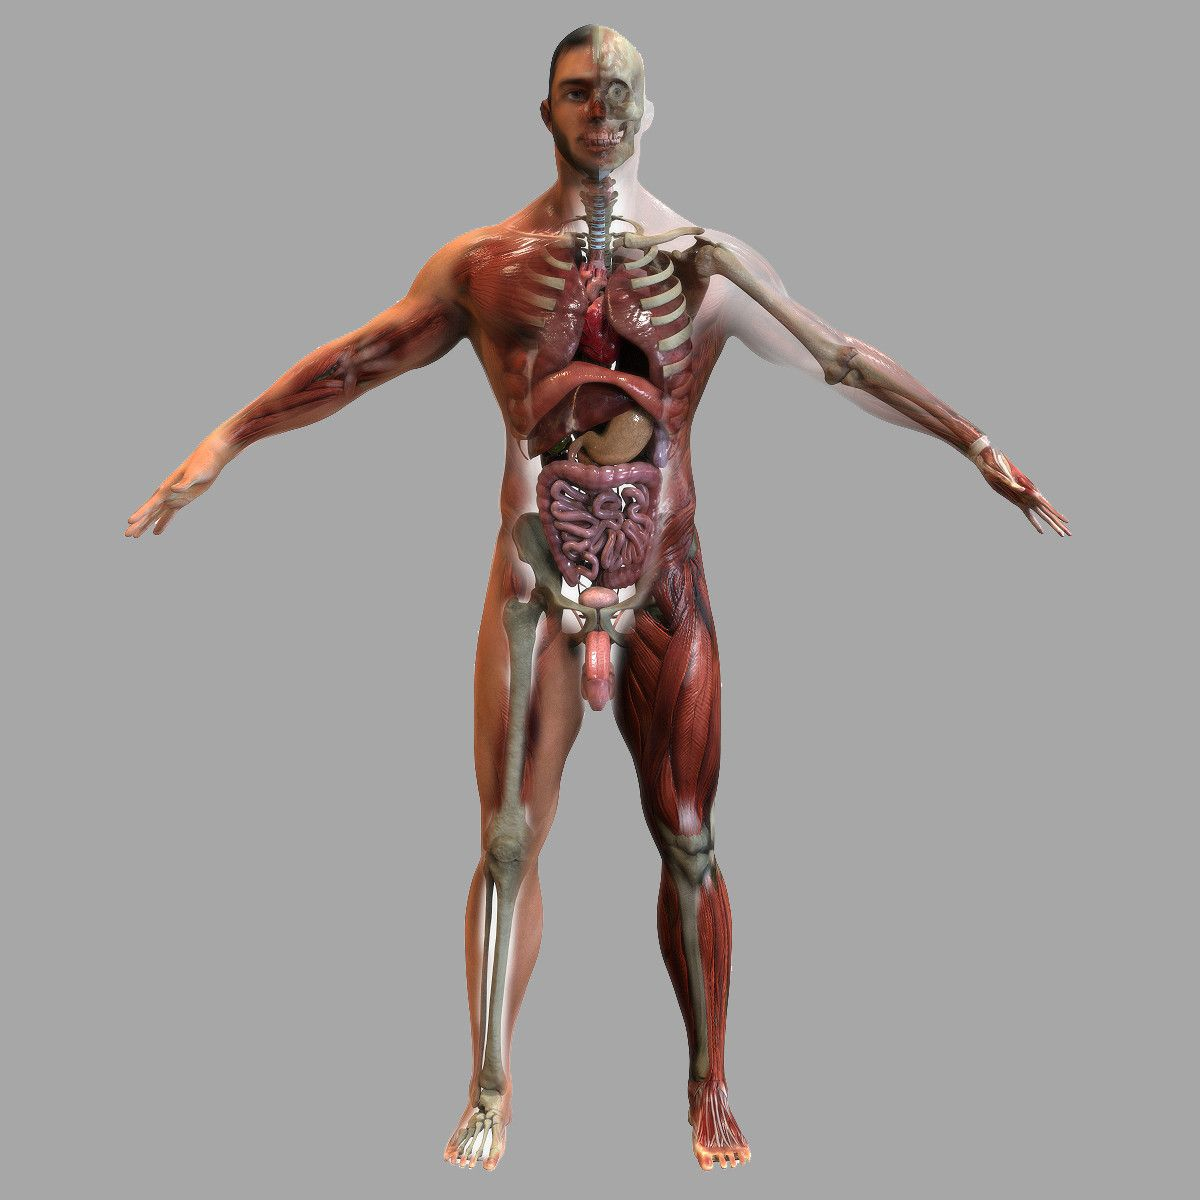 3d model male anatomy | 3d printing | Pinterest | 3d anatomy ...